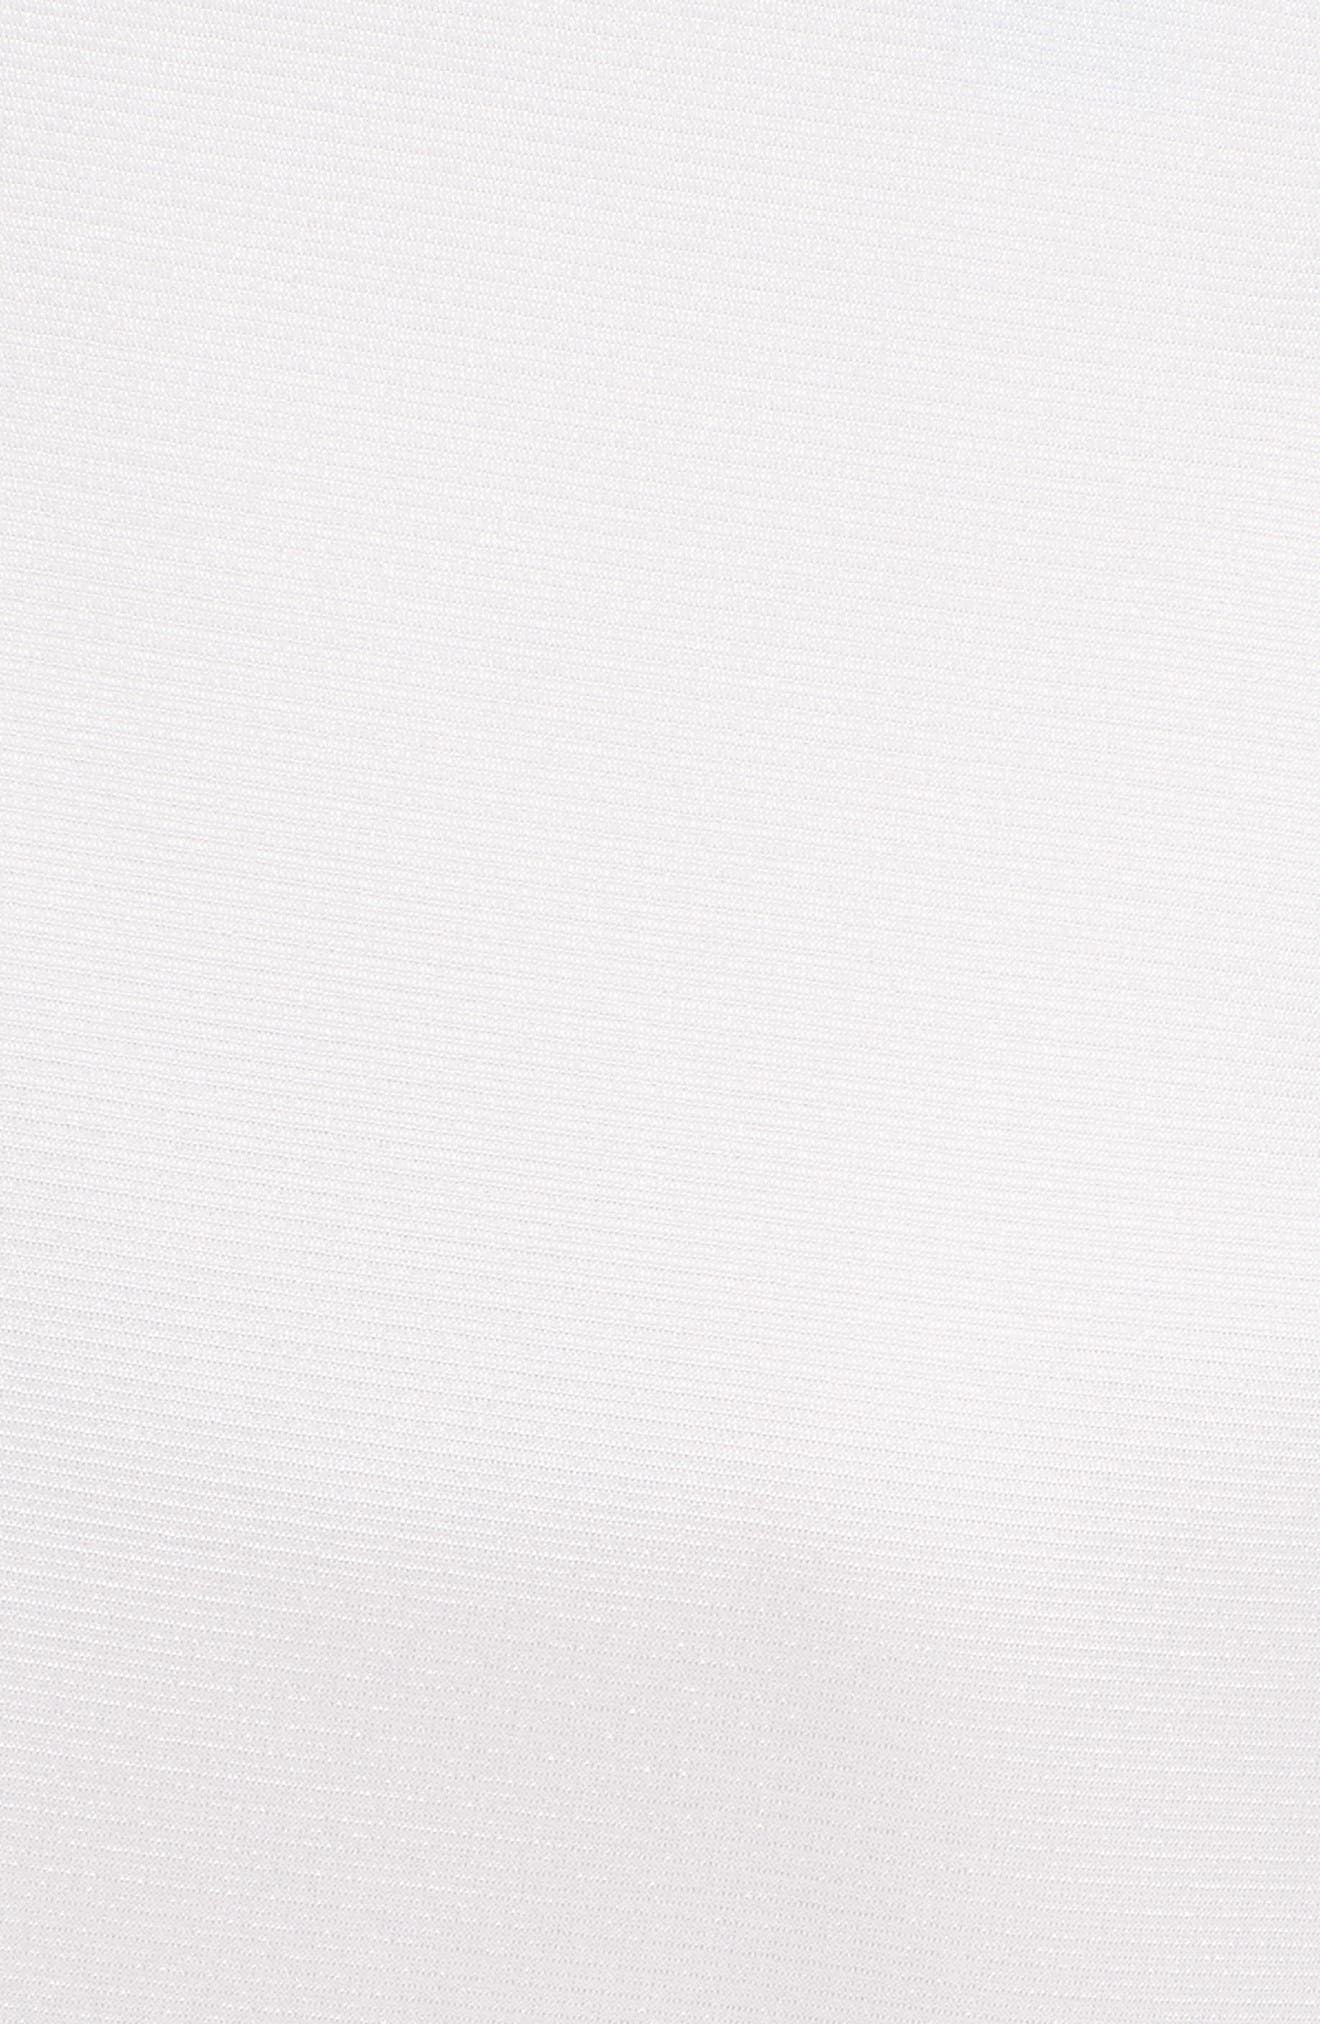 V-Neck Blouse with Bow Detail,                             Alternate thumbnail 6, color,                             White